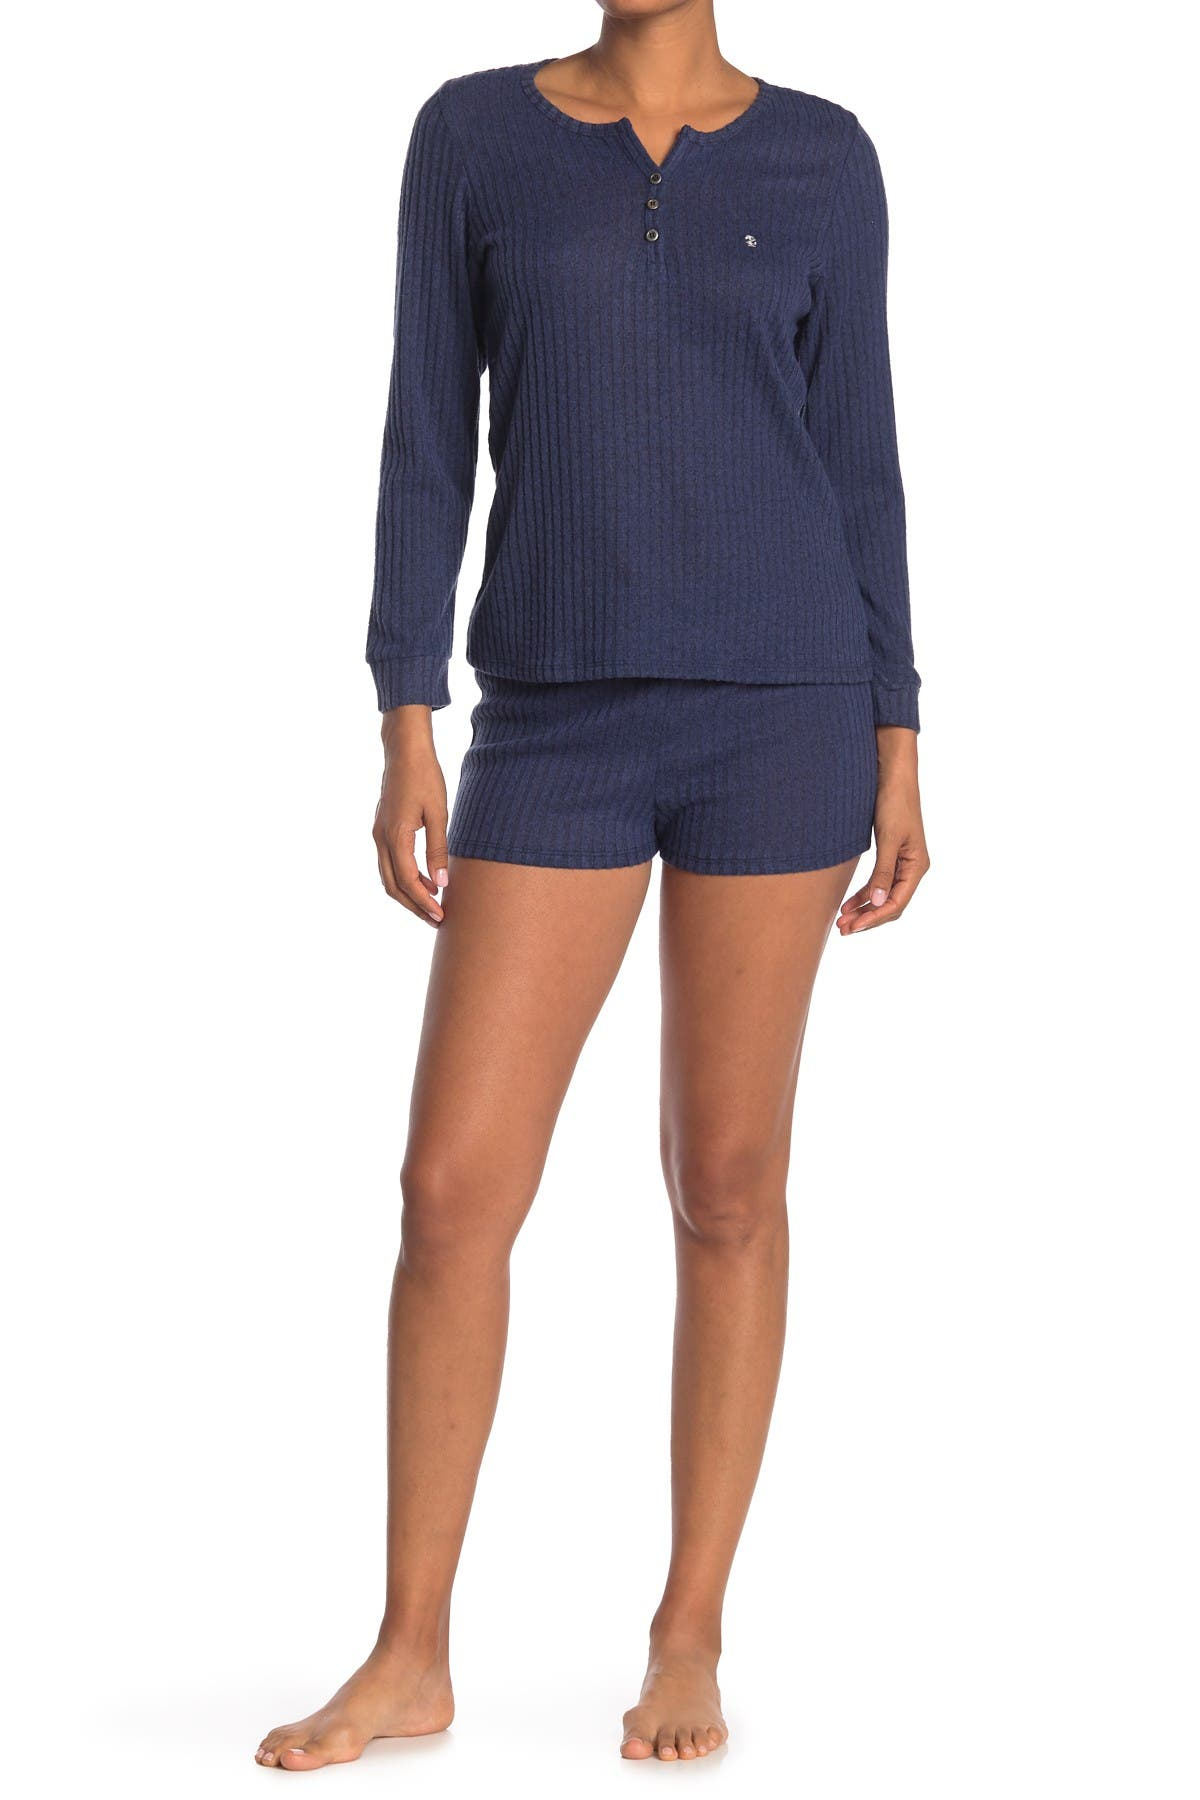 Image of Izod Henley Top & Short 2-Piece Pajama Set